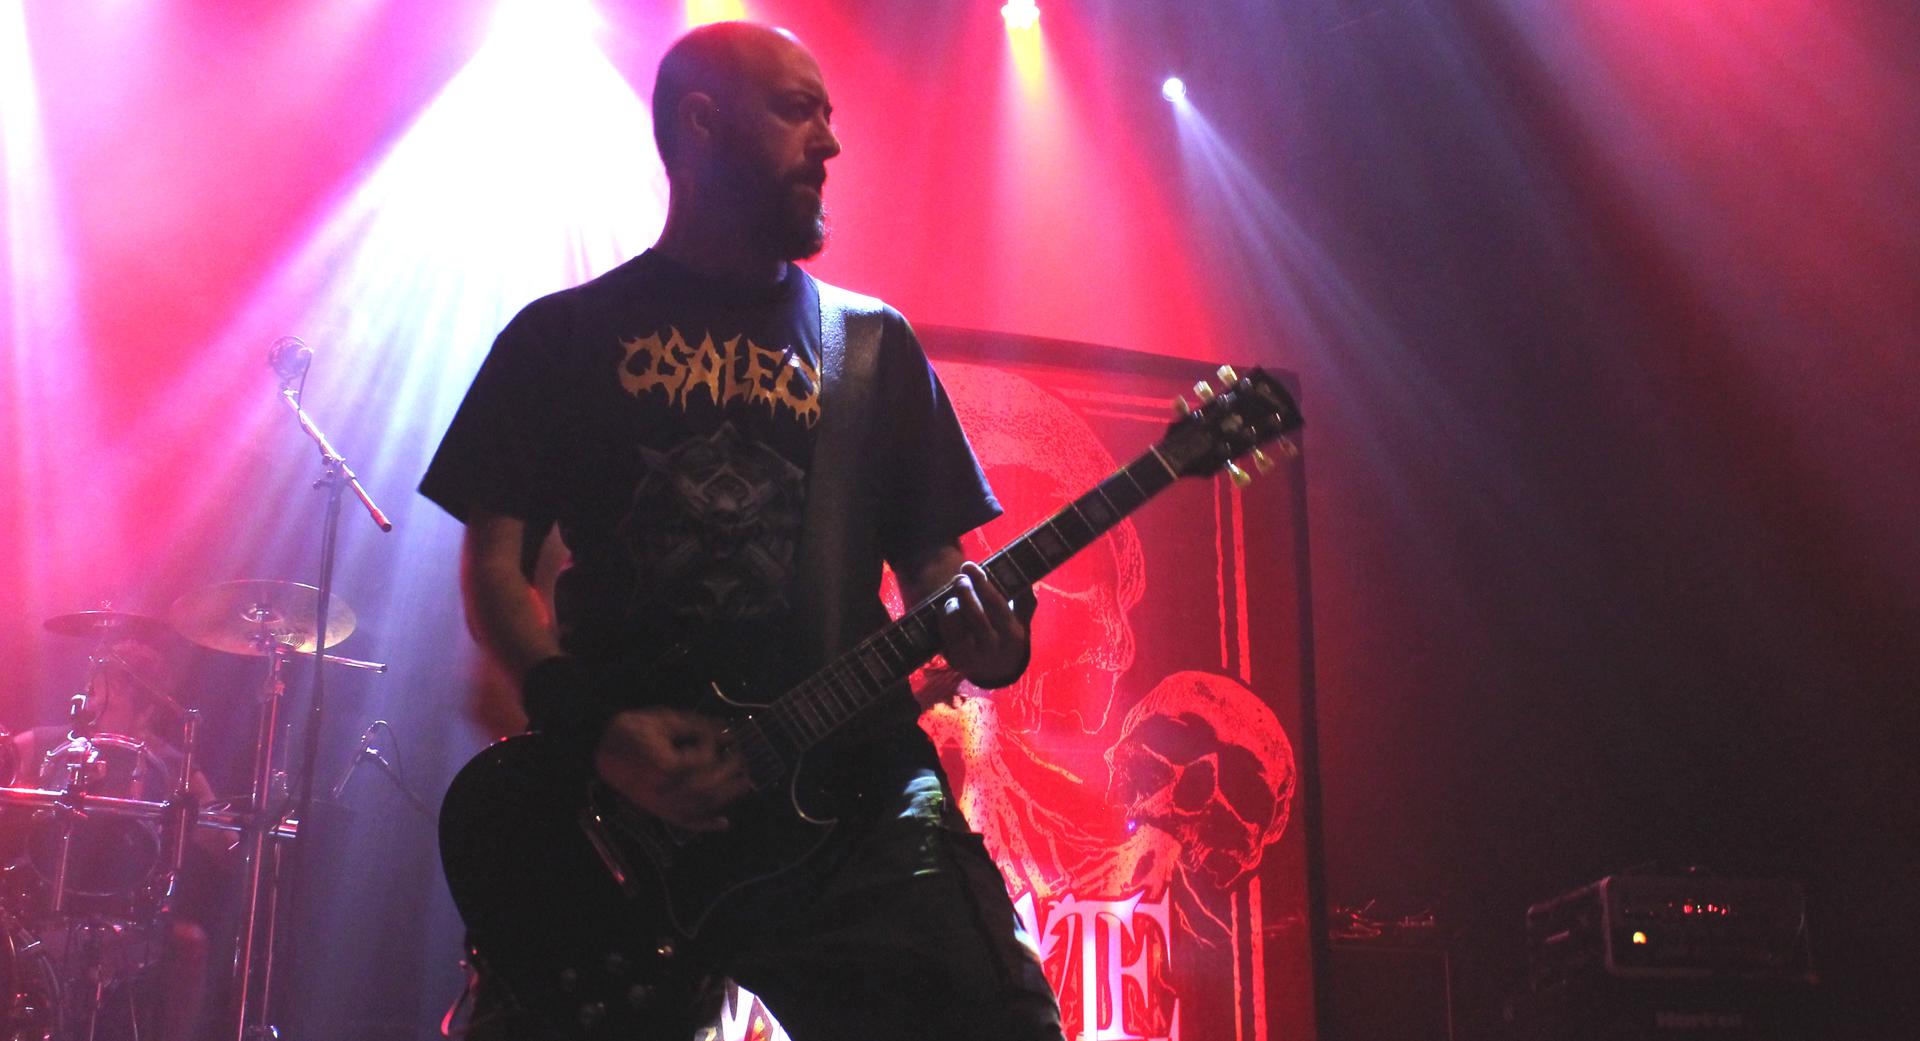 karonte death metal